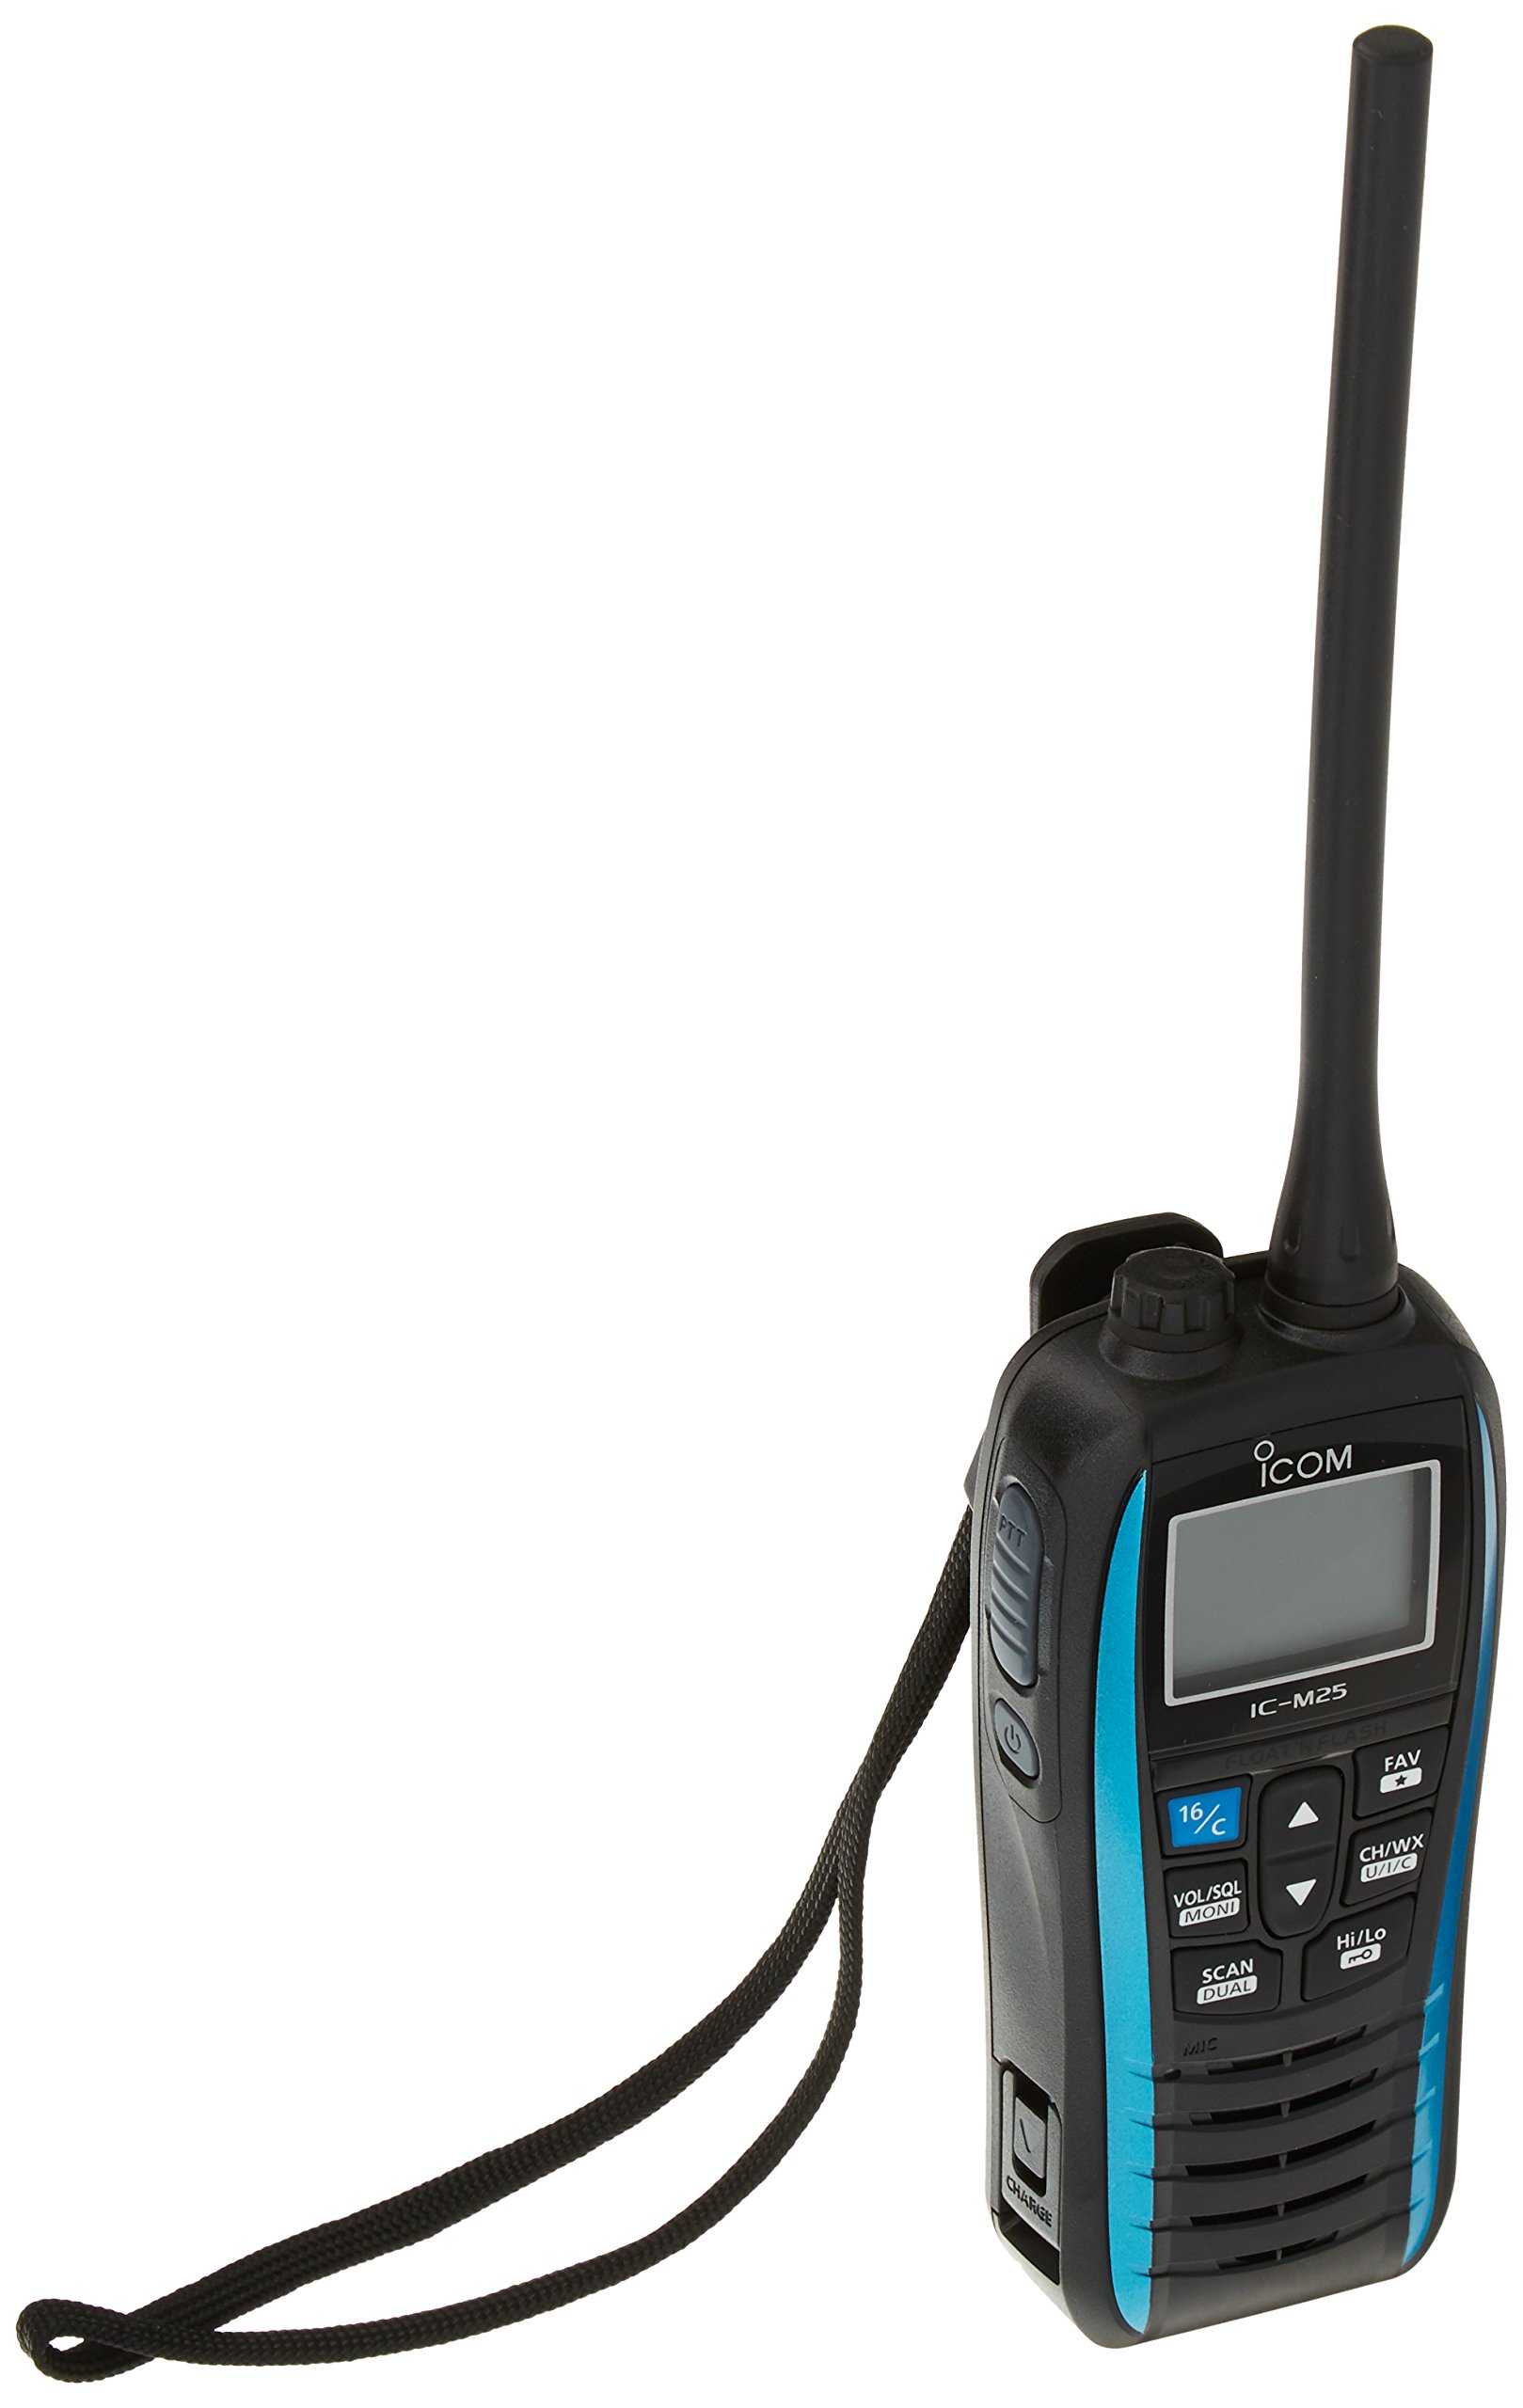 ICOM IC-M25 21 Handheld VHF Radio - Blue Trim